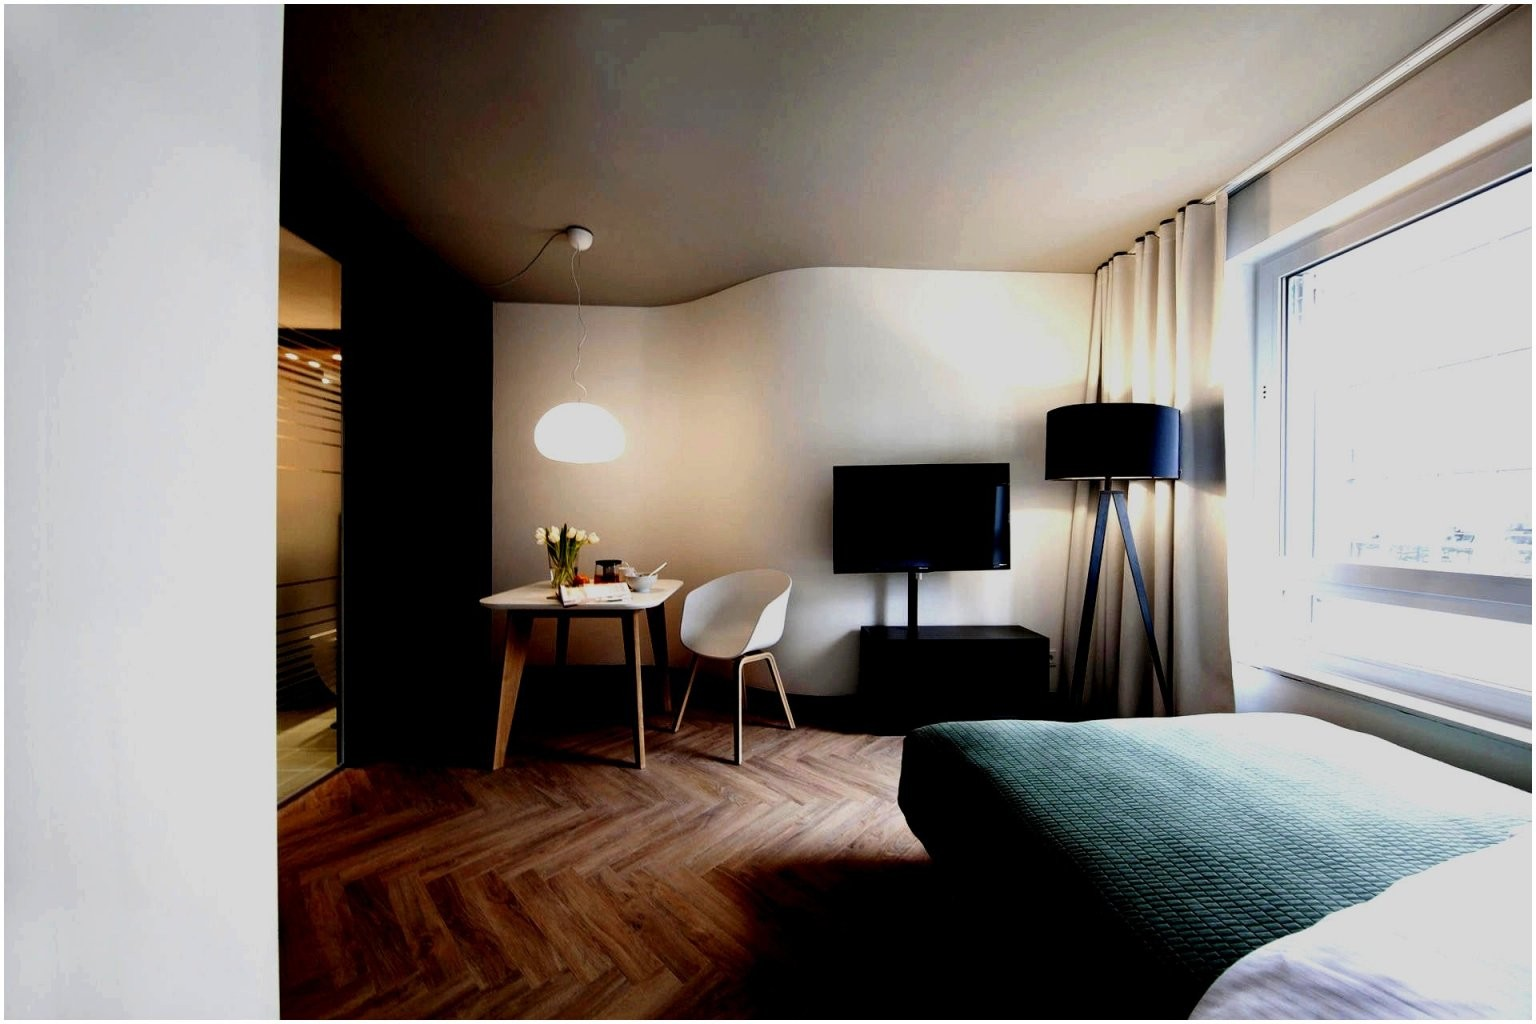 Wohnung Mieten München Provisionsfrei Hausdesign Pretentious von 2 Zimmer Wohnung Mieten München Provisionsfrei Bild